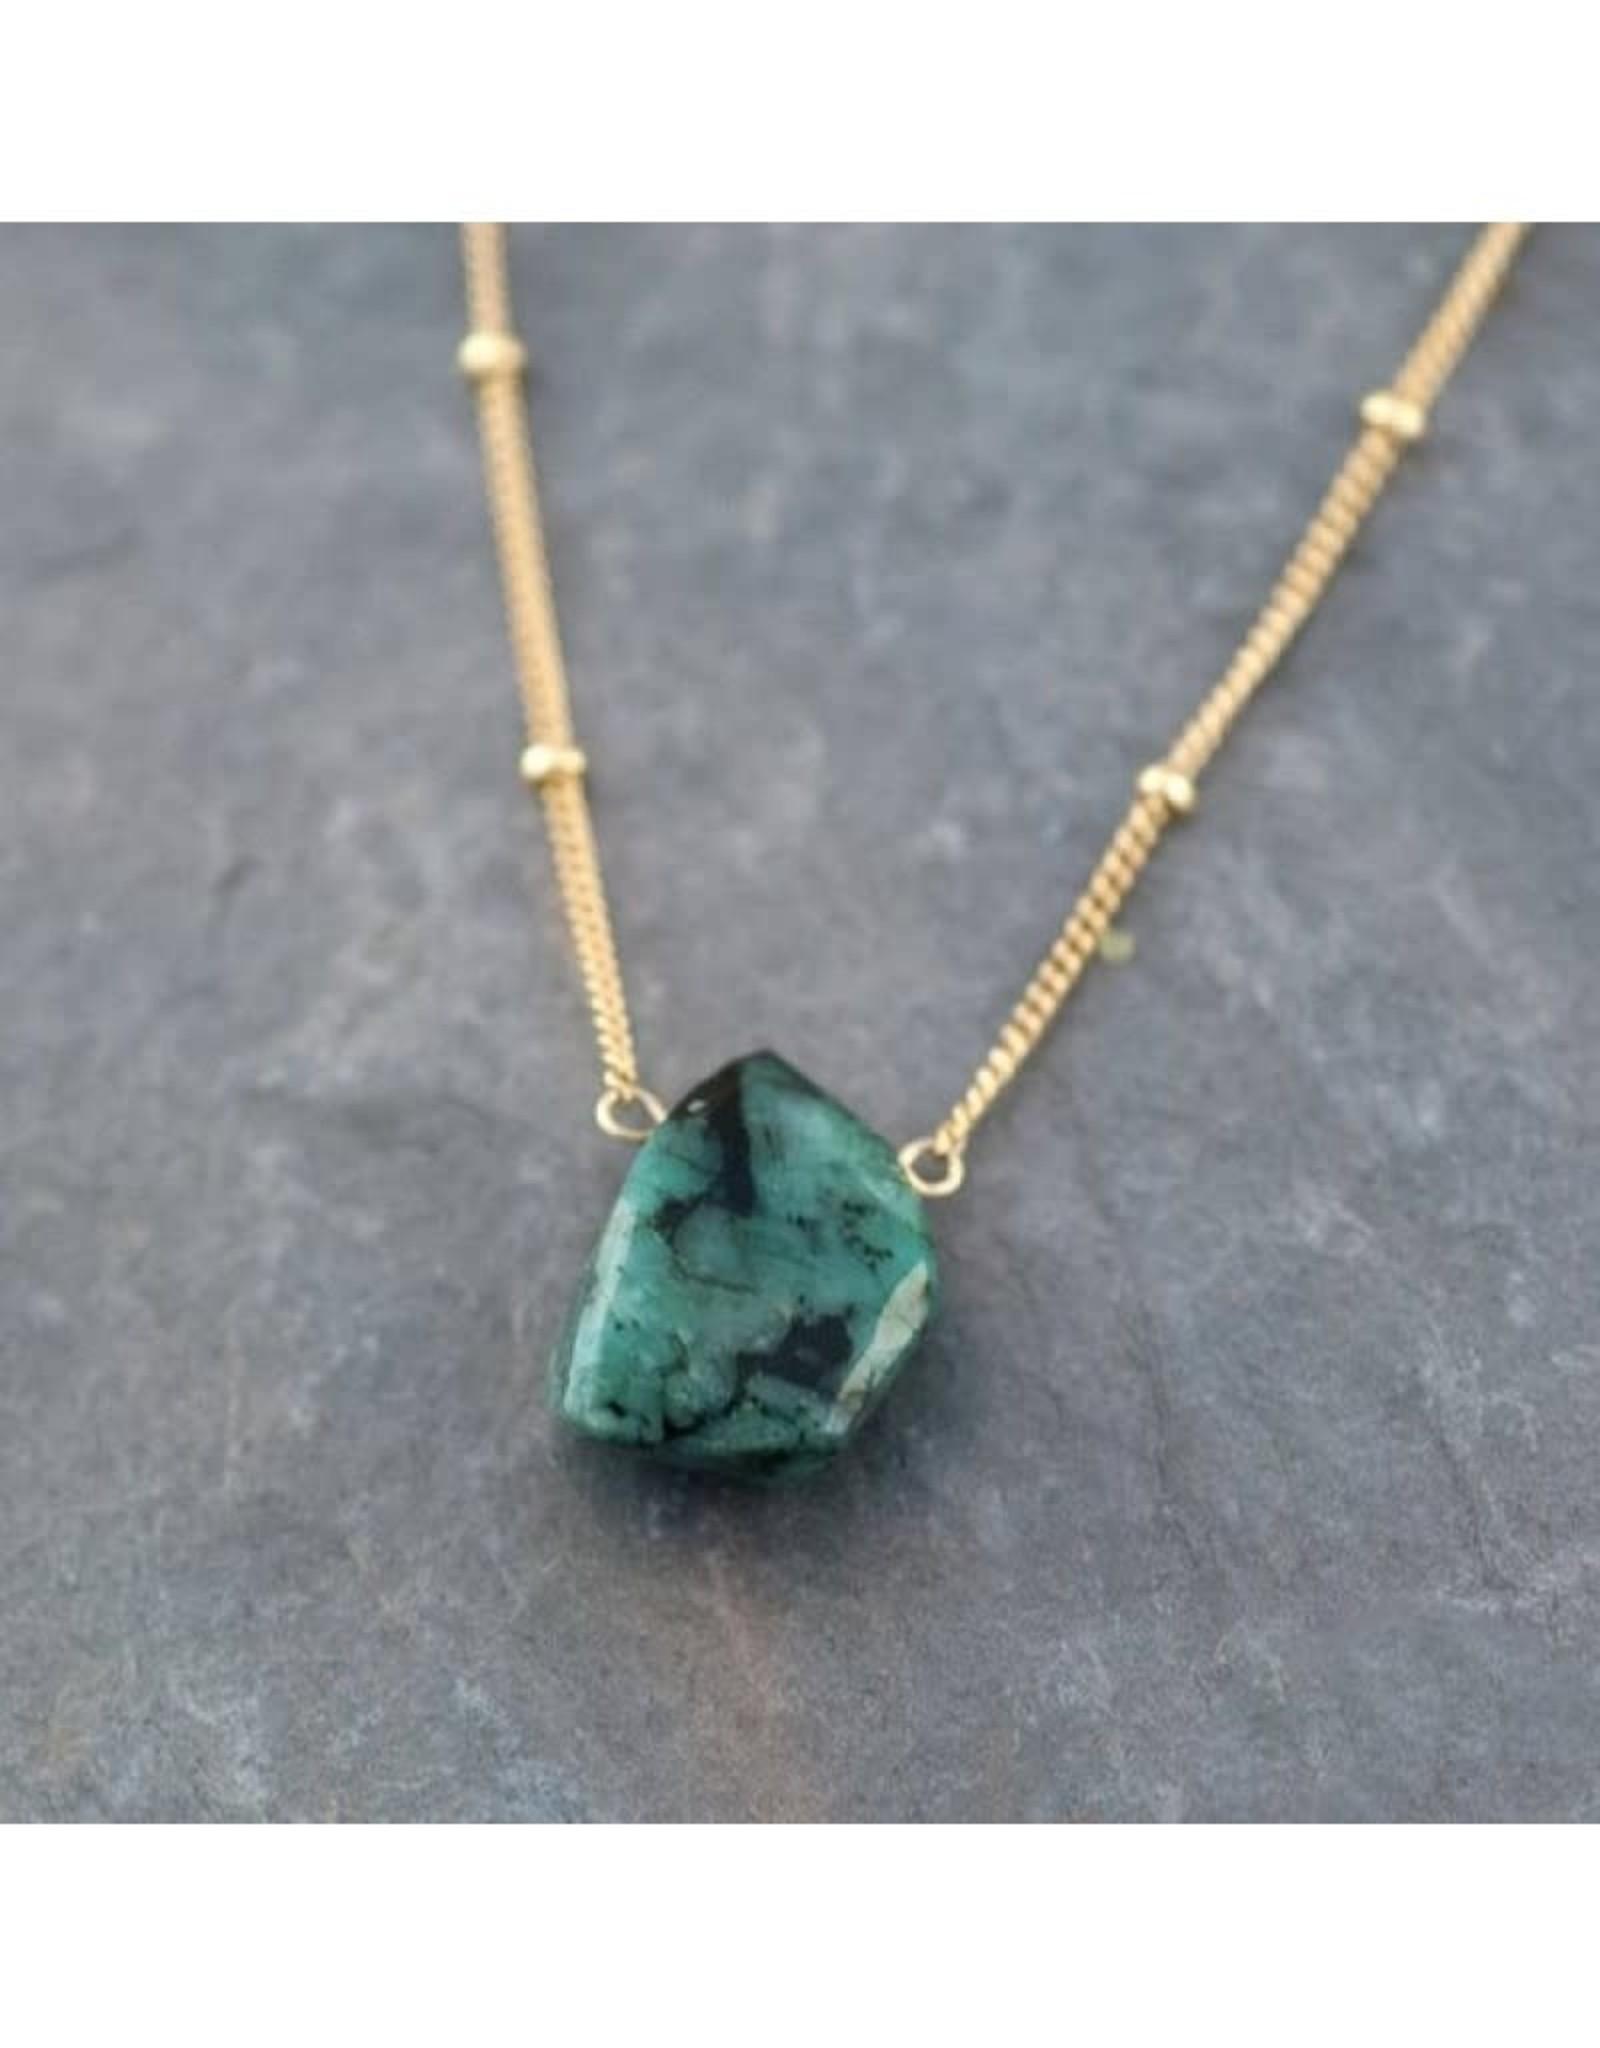 Raw Gemstone Necklace - Emerald